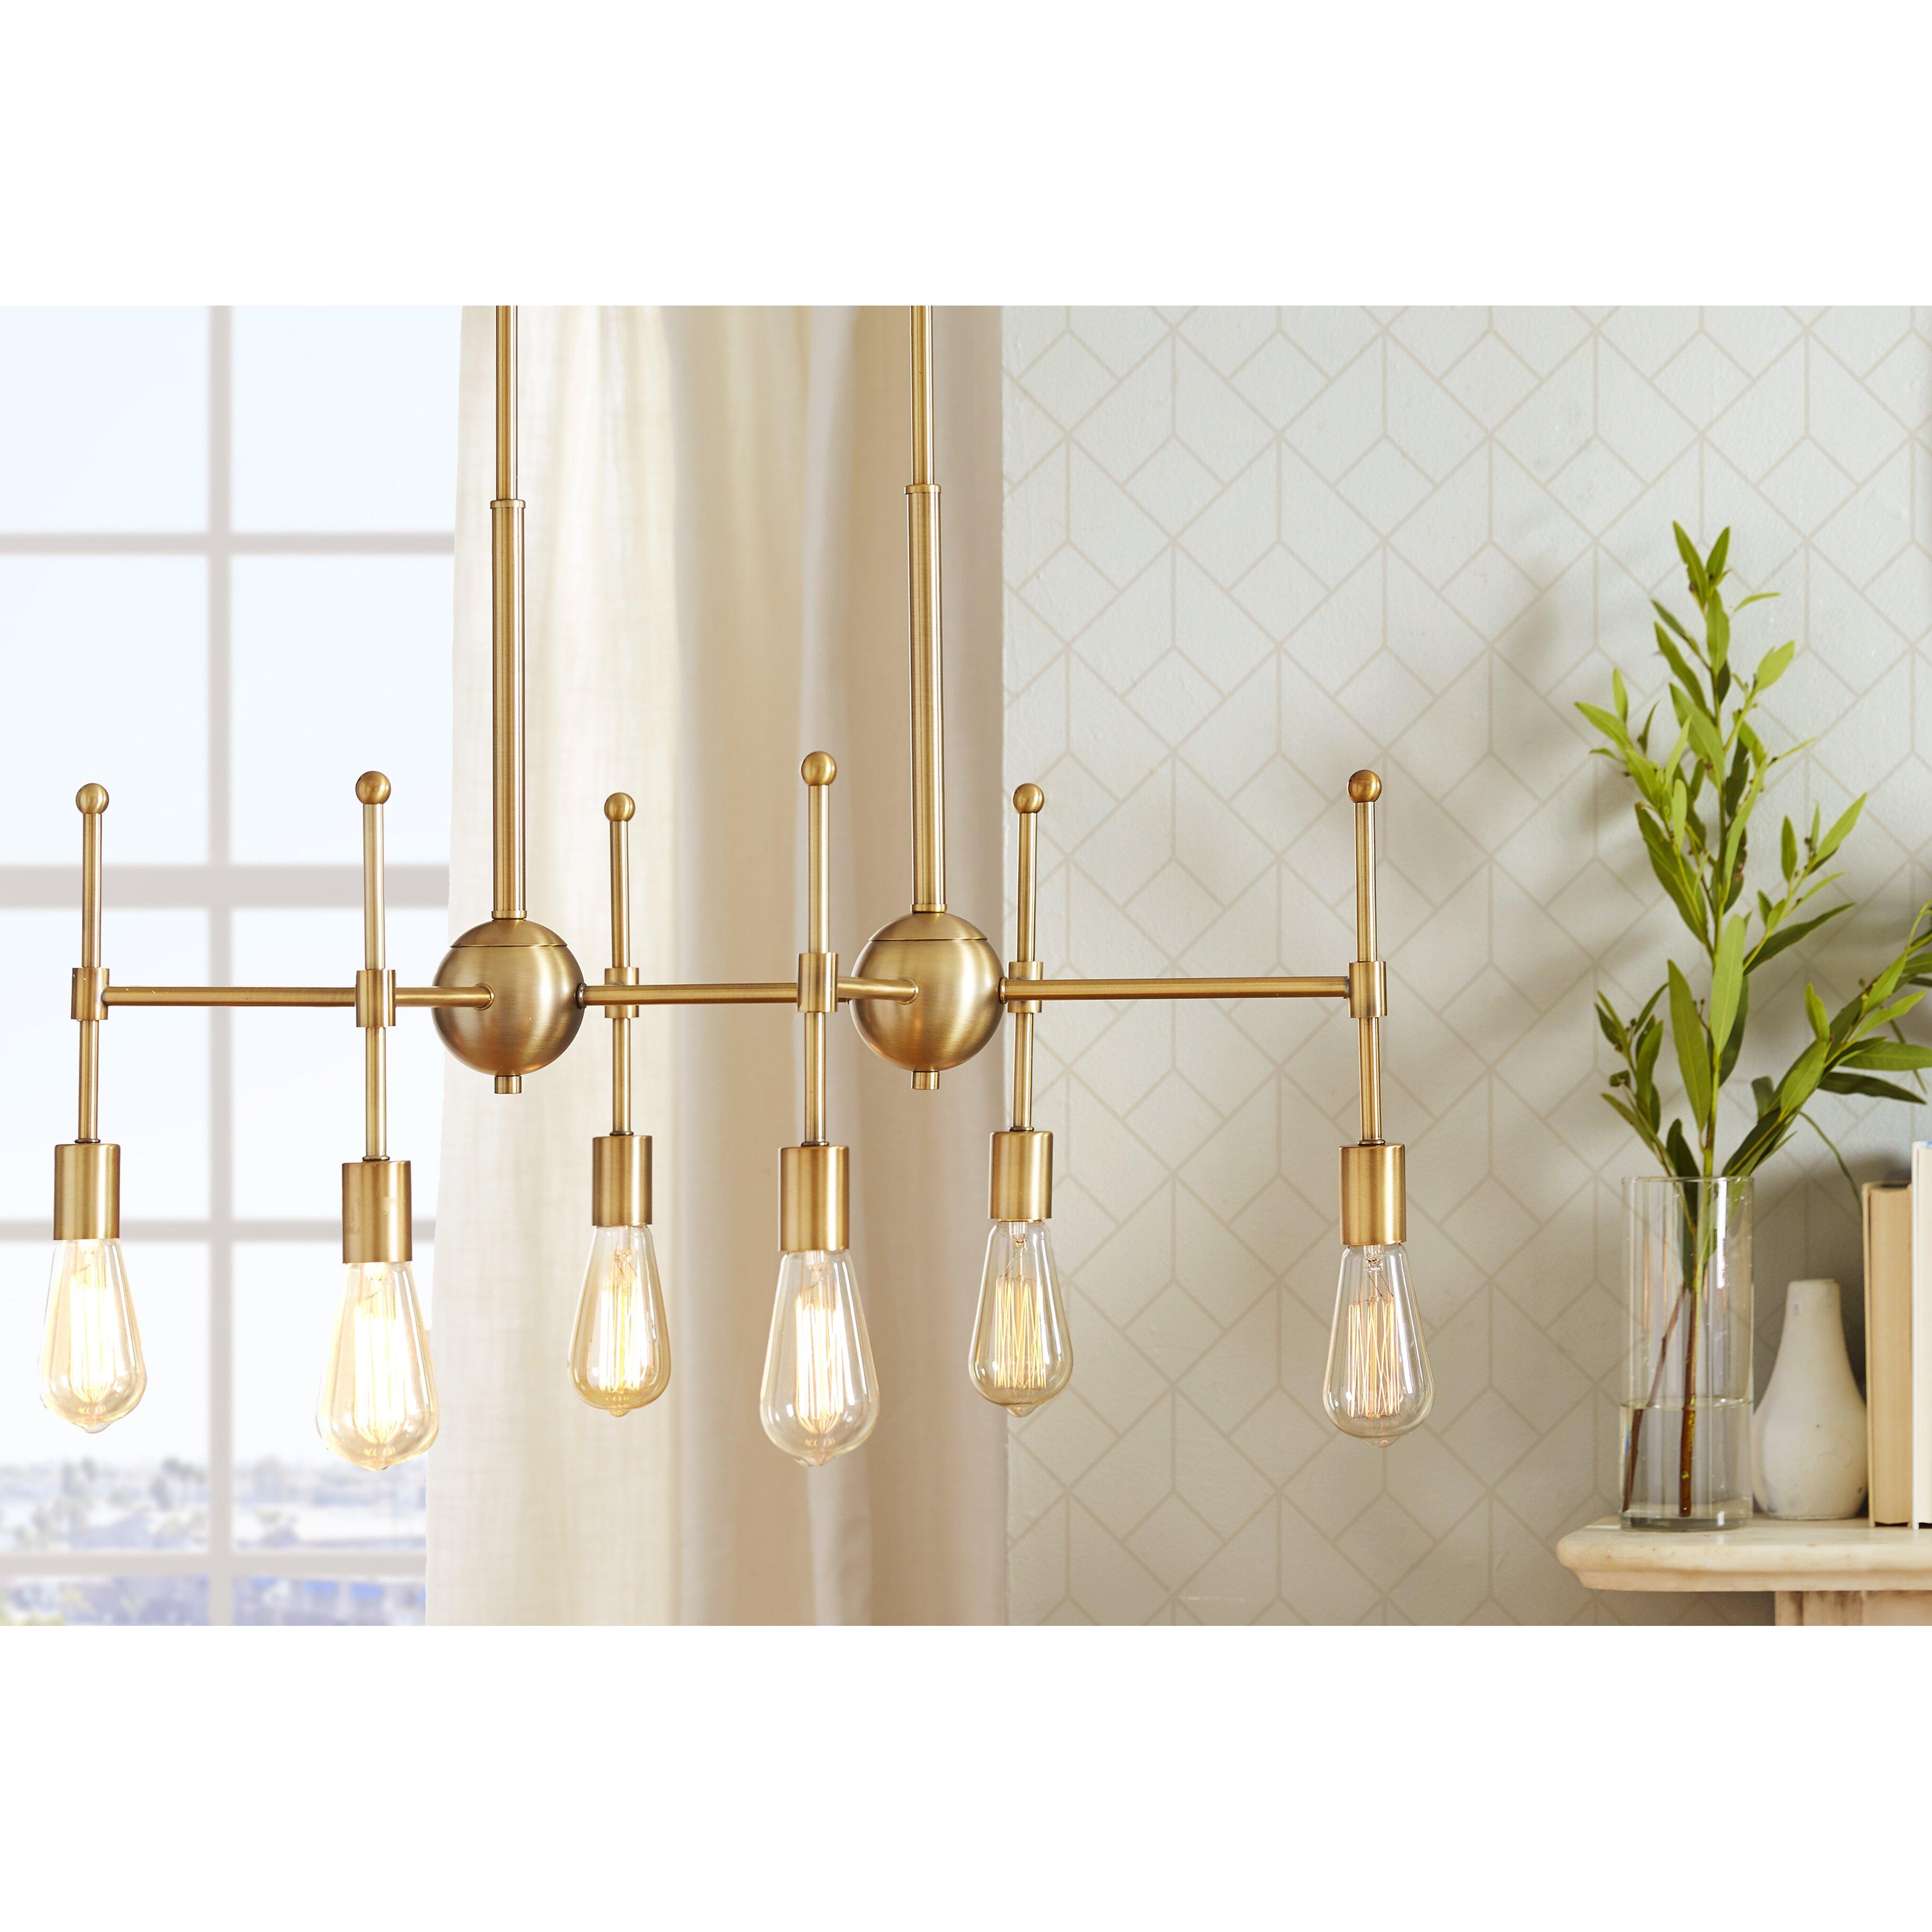 st helens light kitchen island pendant  reviews  allmodern, Lighting ideas